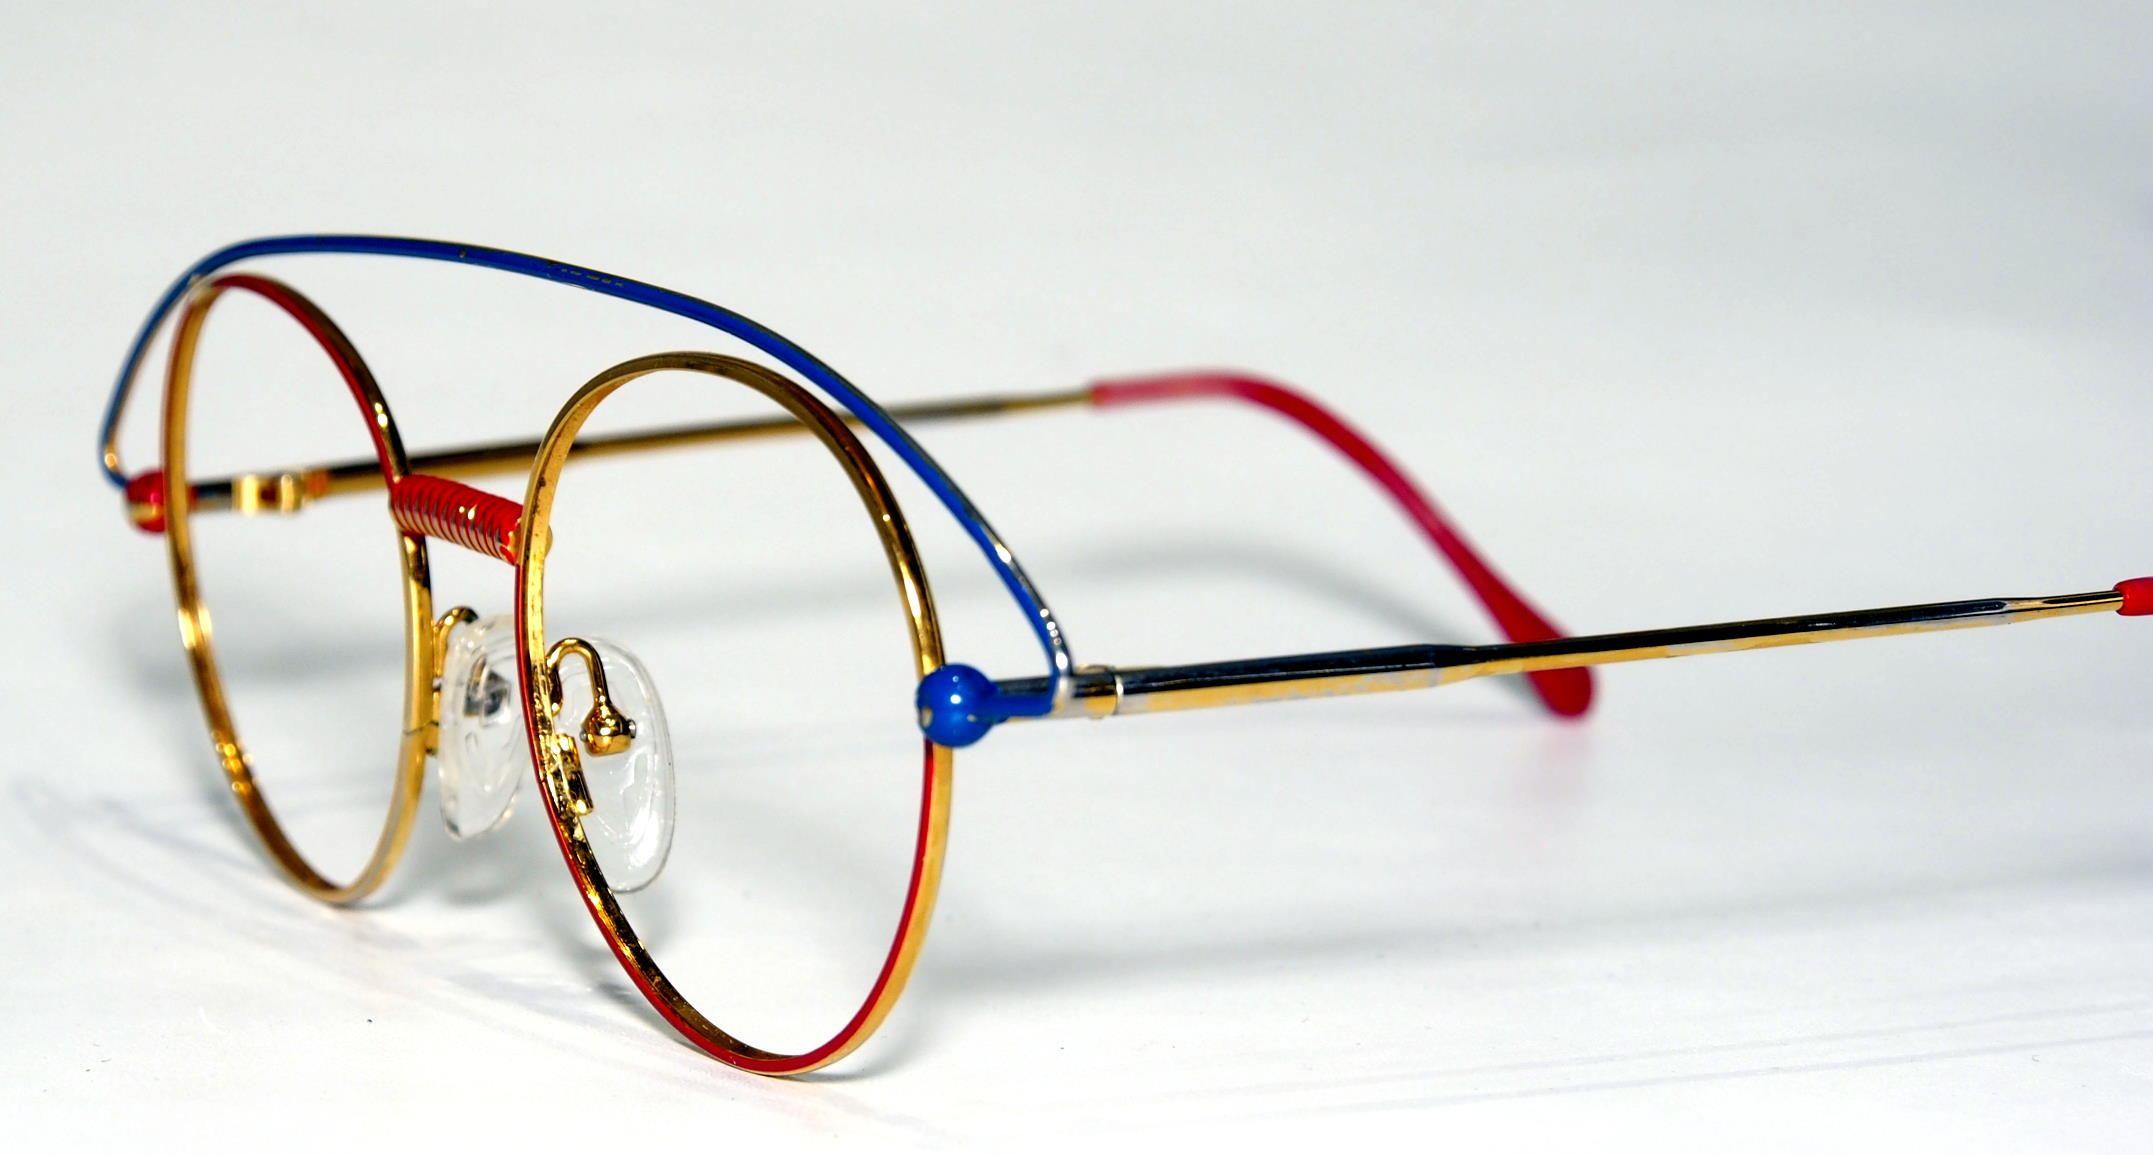 Casanova eyewear, Modell MTC 4 Brille Made in Italy